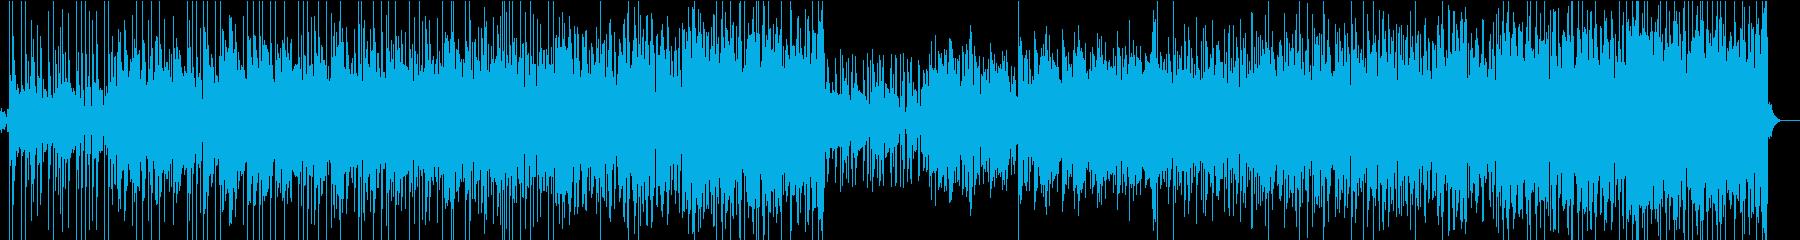 FunkyなRockの再生済みの波形